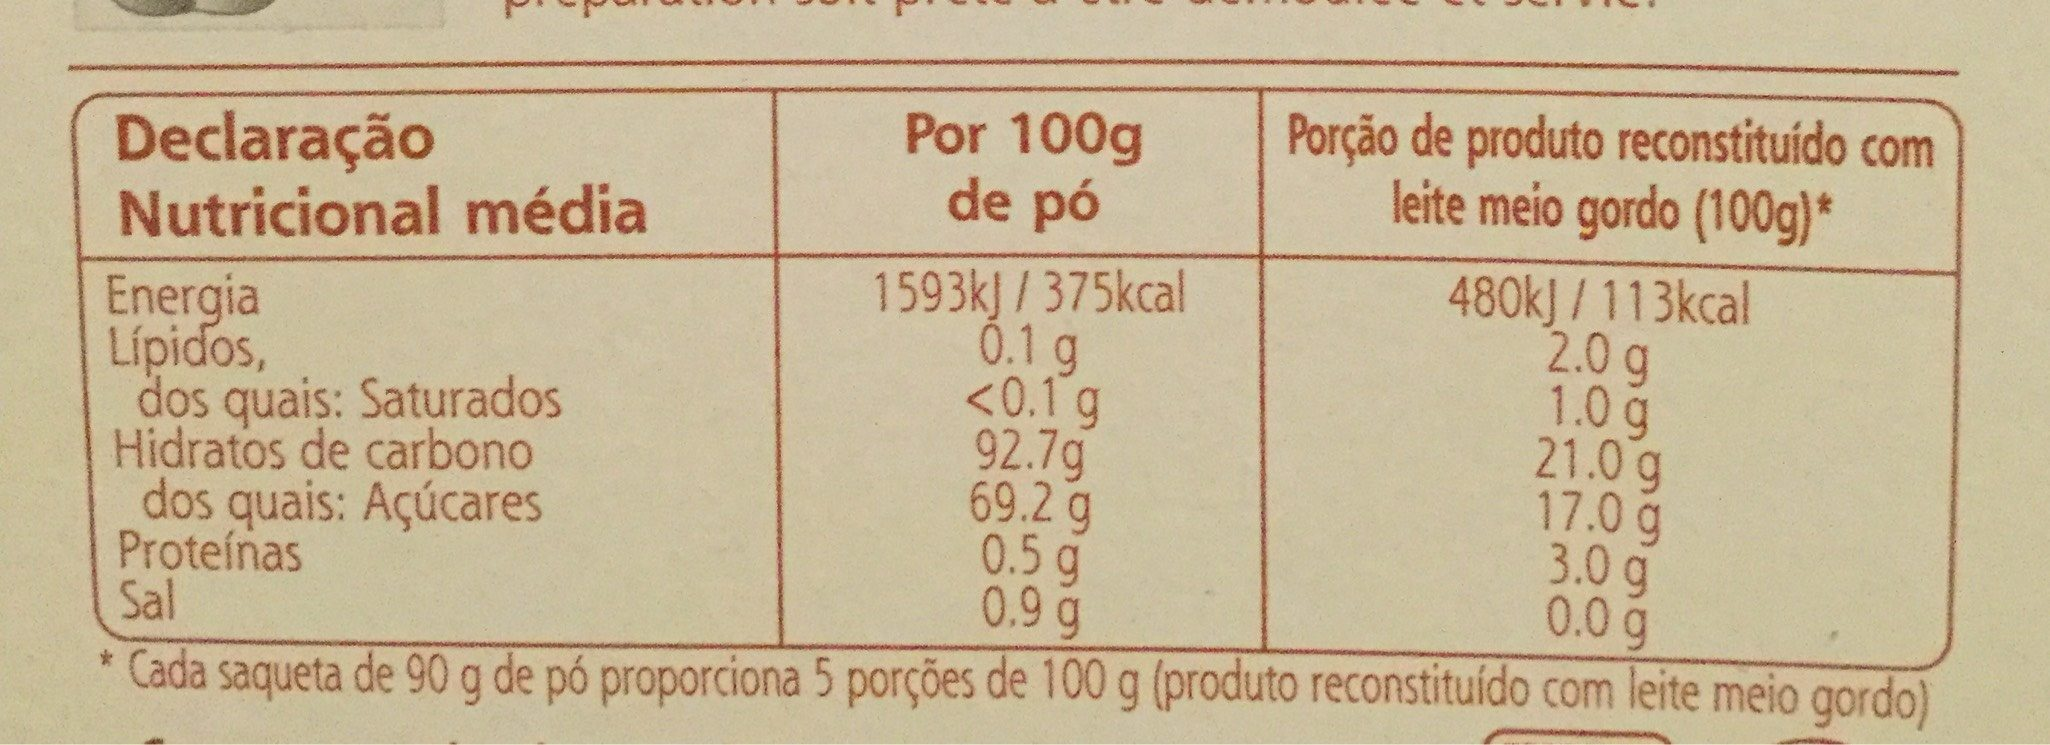 Preparado de pudim de caramelo - Informations nutritionnelles - fr